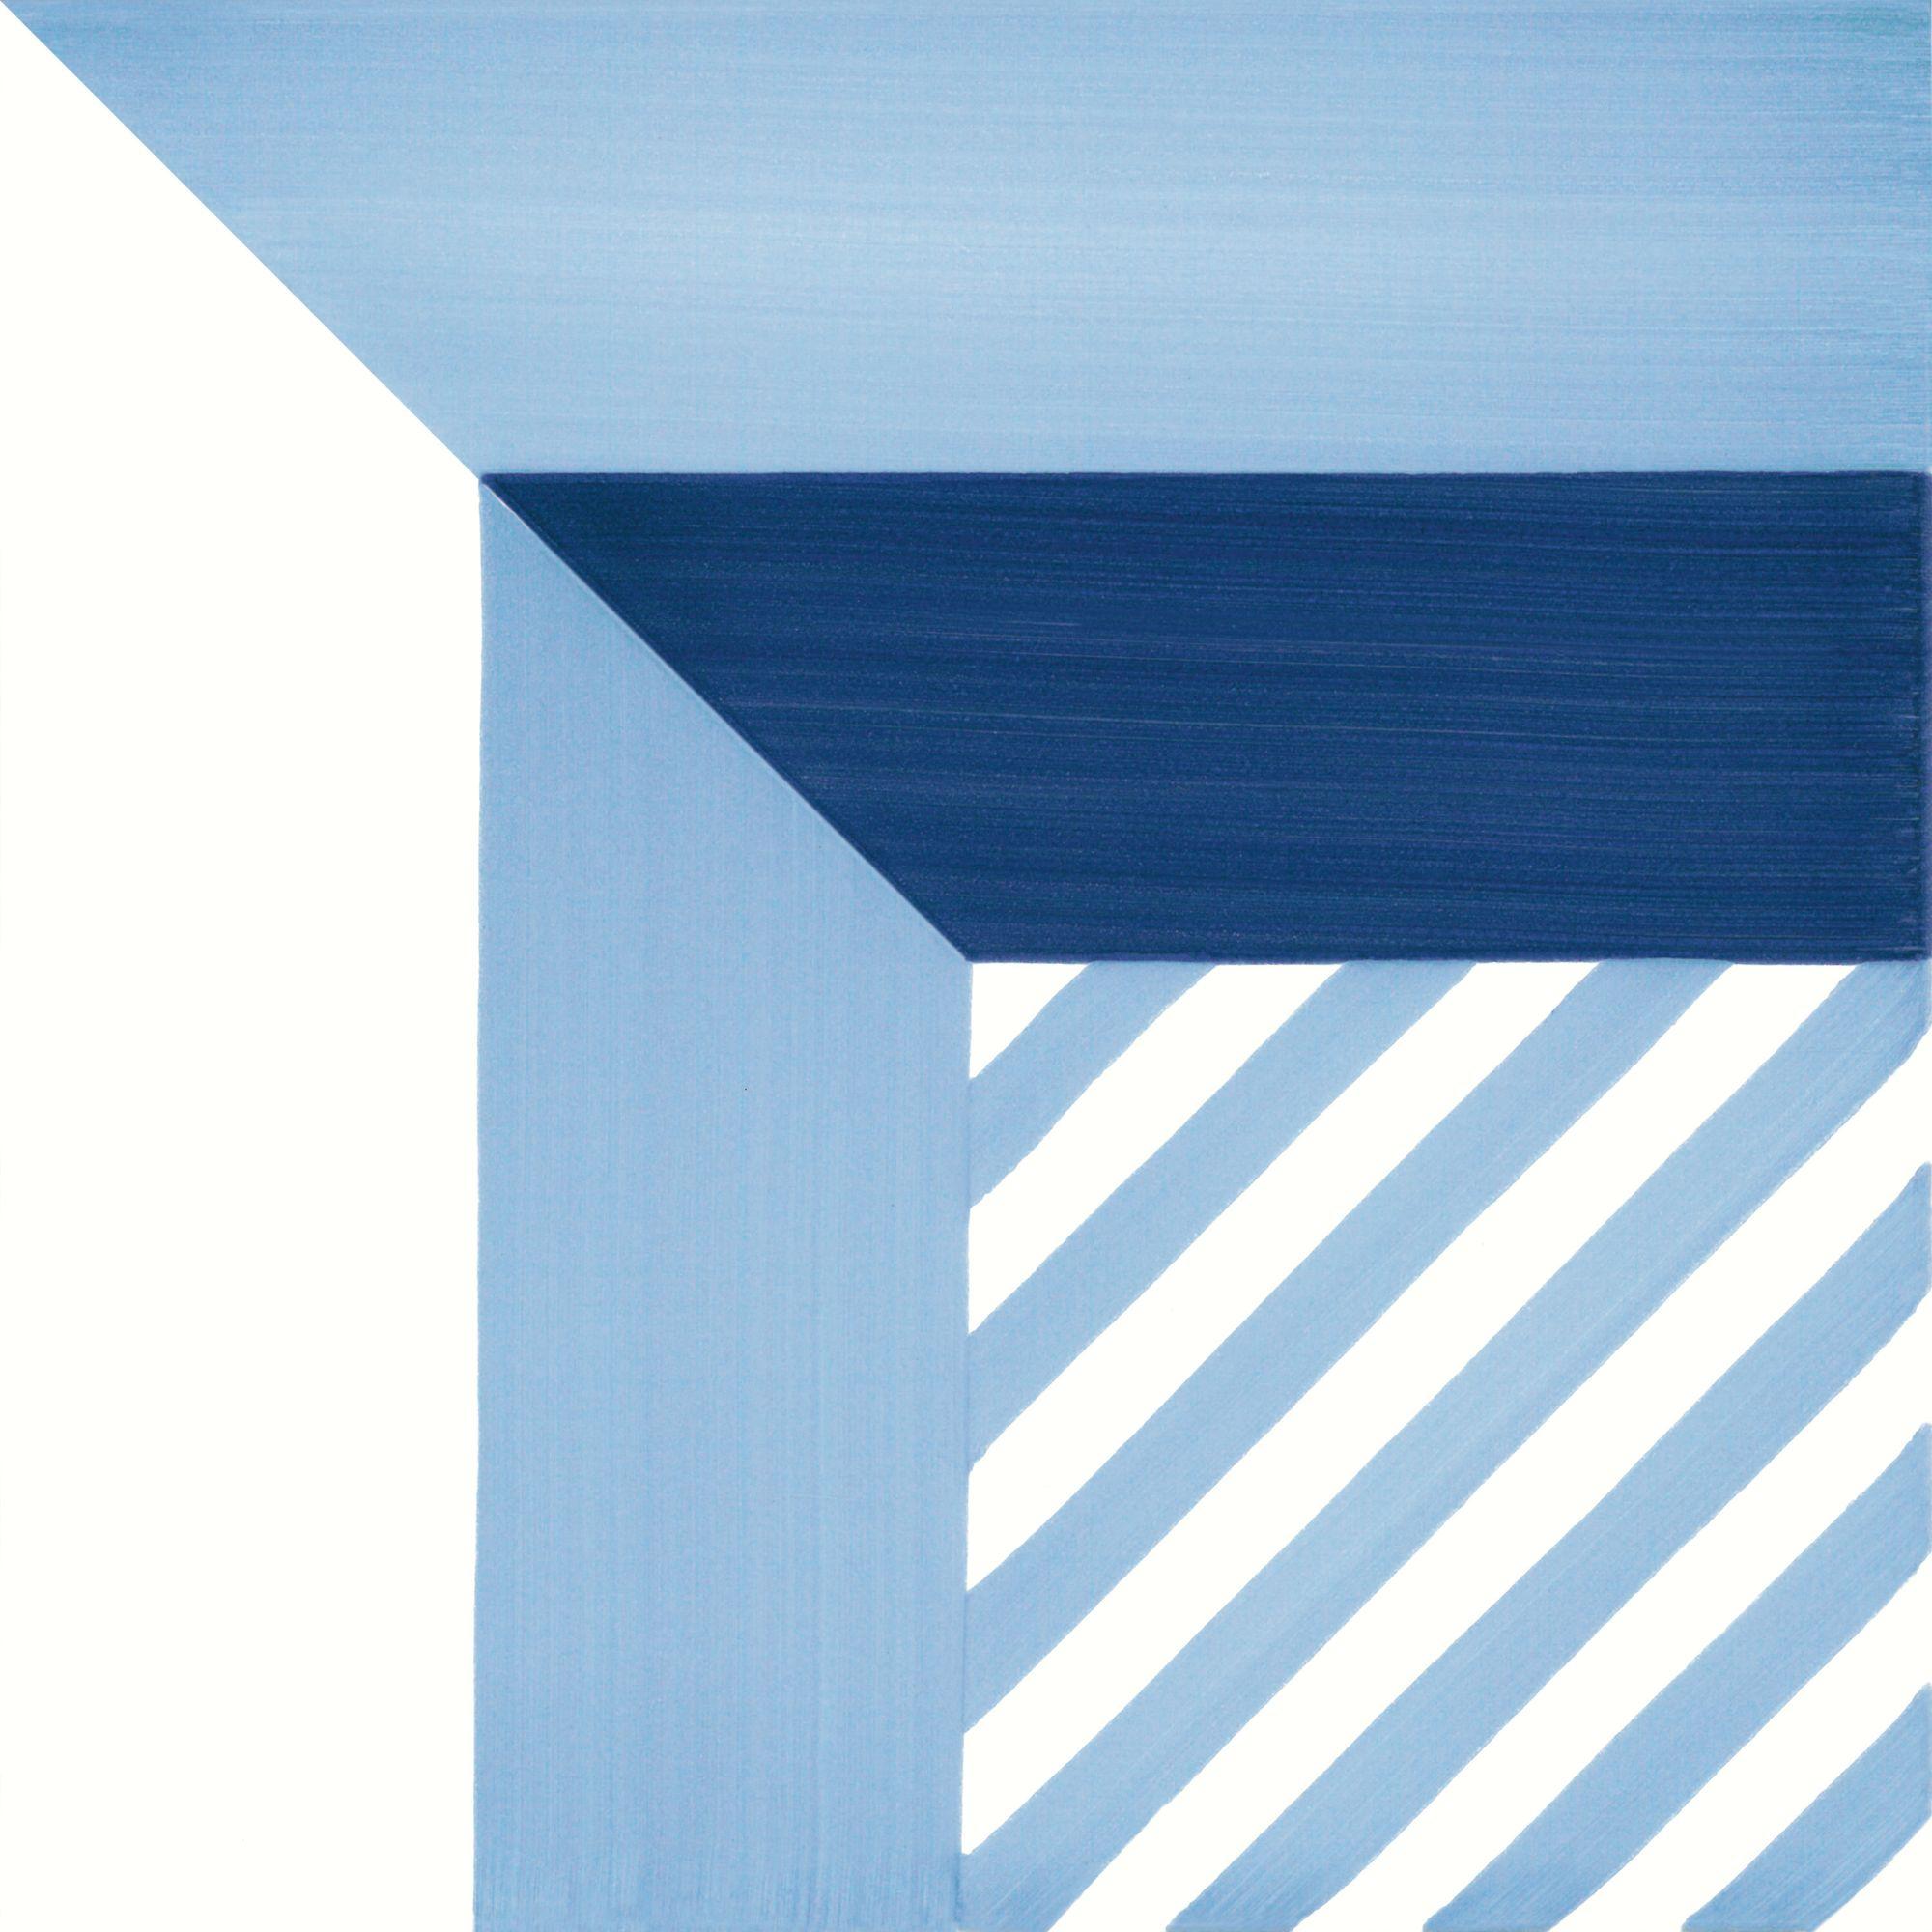 blu-ponti-decoro-tipo-13